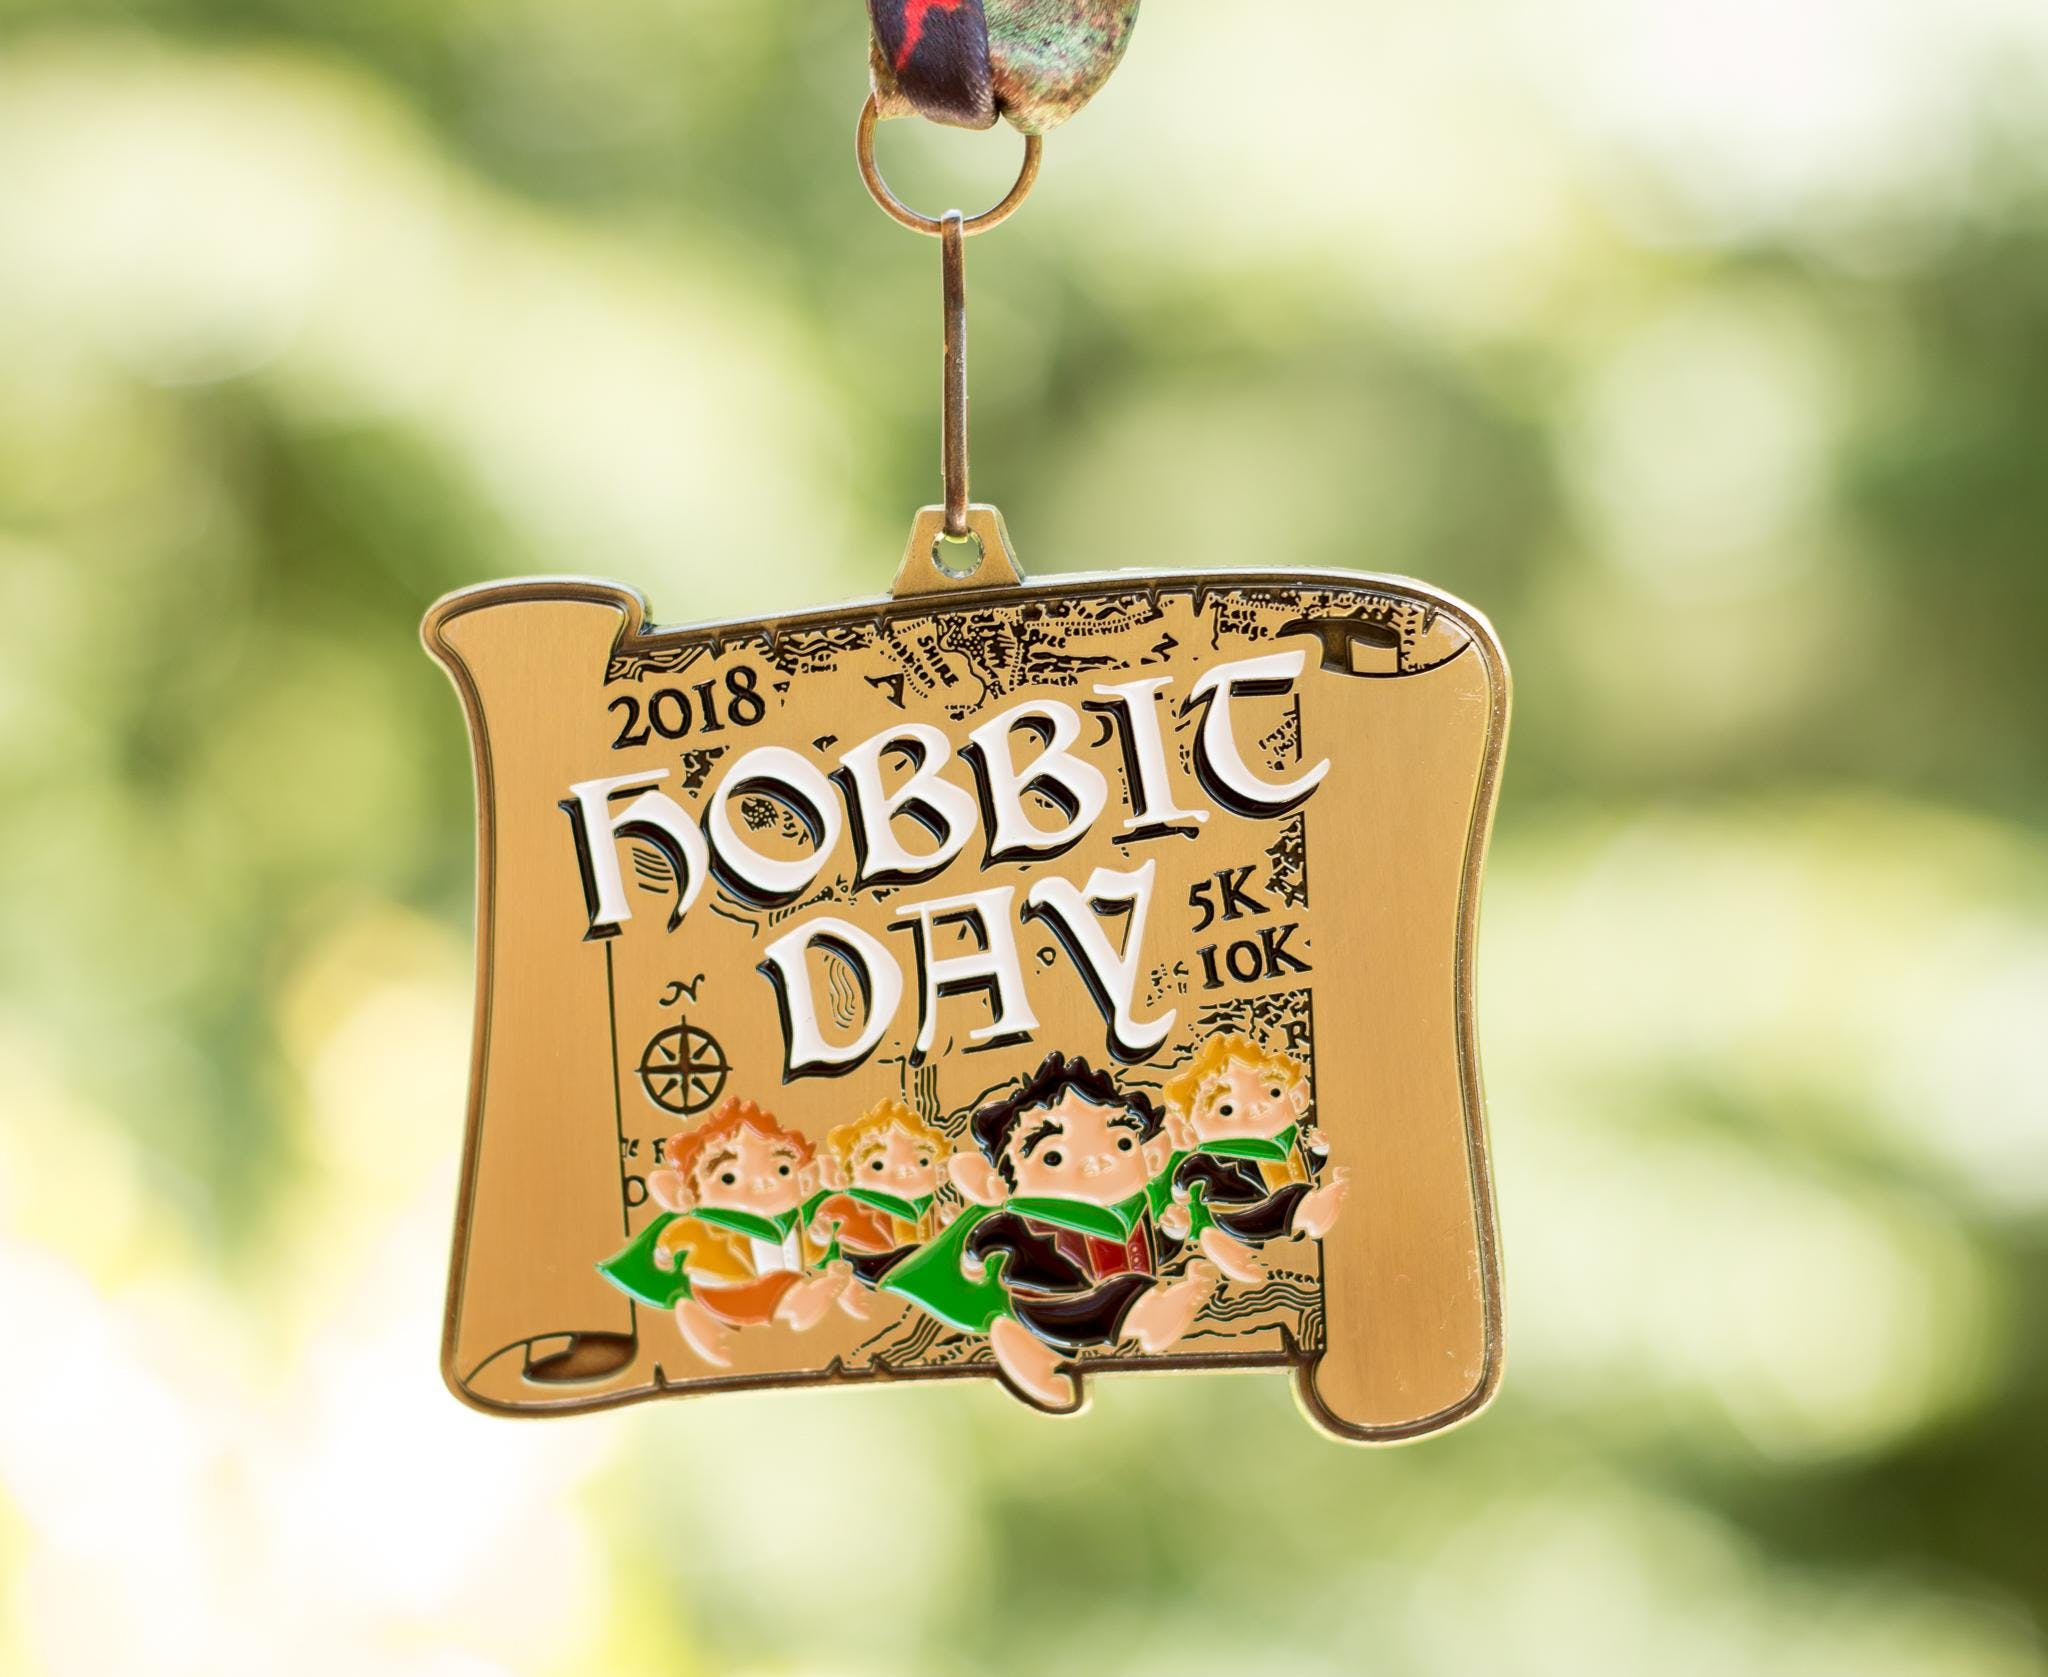 Hobbit Day 5K & 10K – Journey to Middle Earth -Winston-Salem